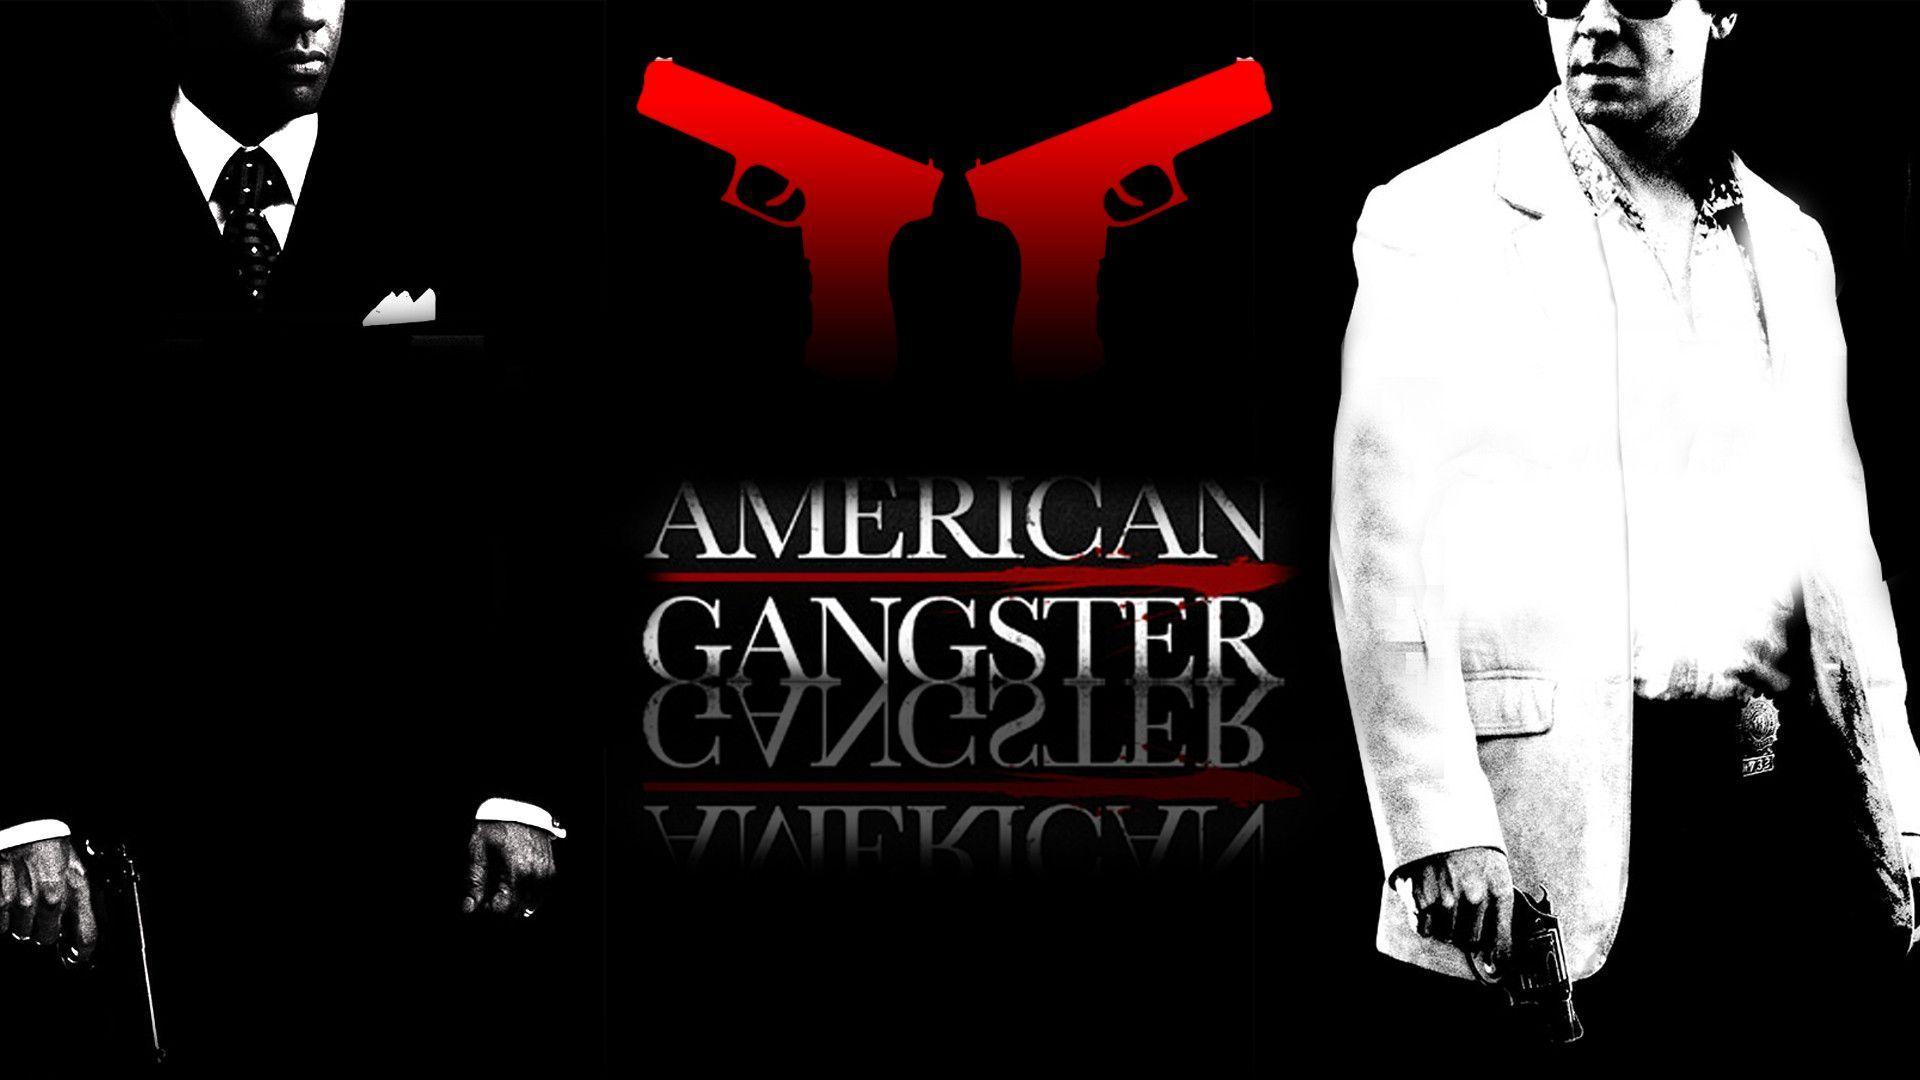 Amazing Wallpaper Logo Gangster - a457ea56c5083123369392dfd5d7b2e6  Gallery_464516.jpg